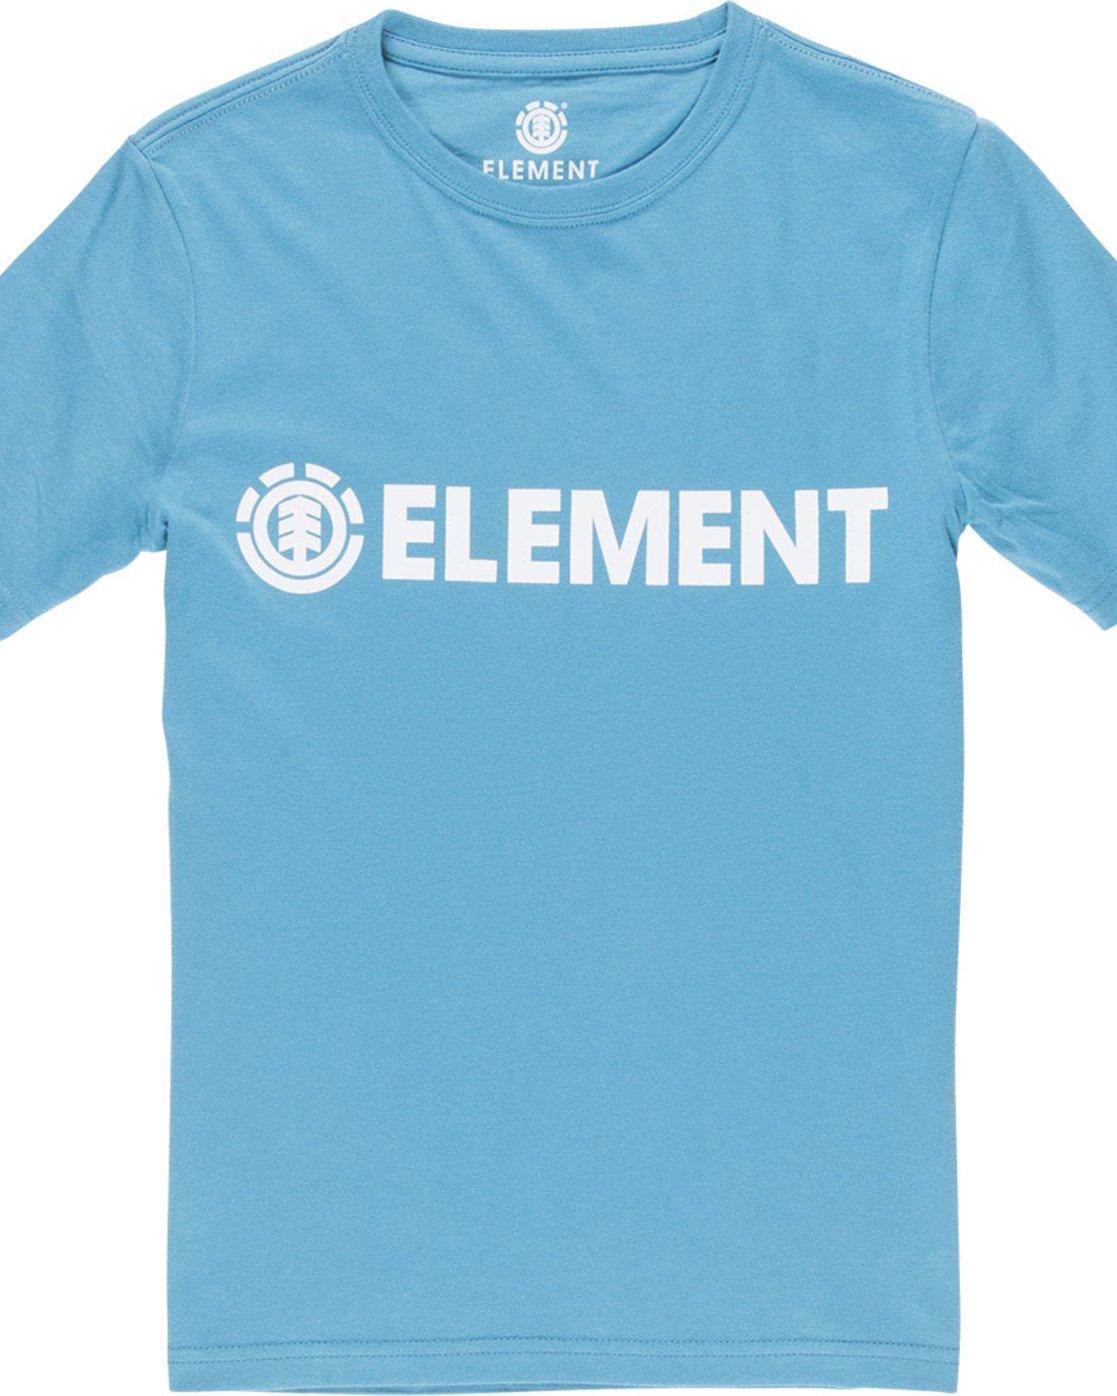 1 Blazin Ss Boy - Tee Shirt for Boys Blue L2SSA2ELF8 Element